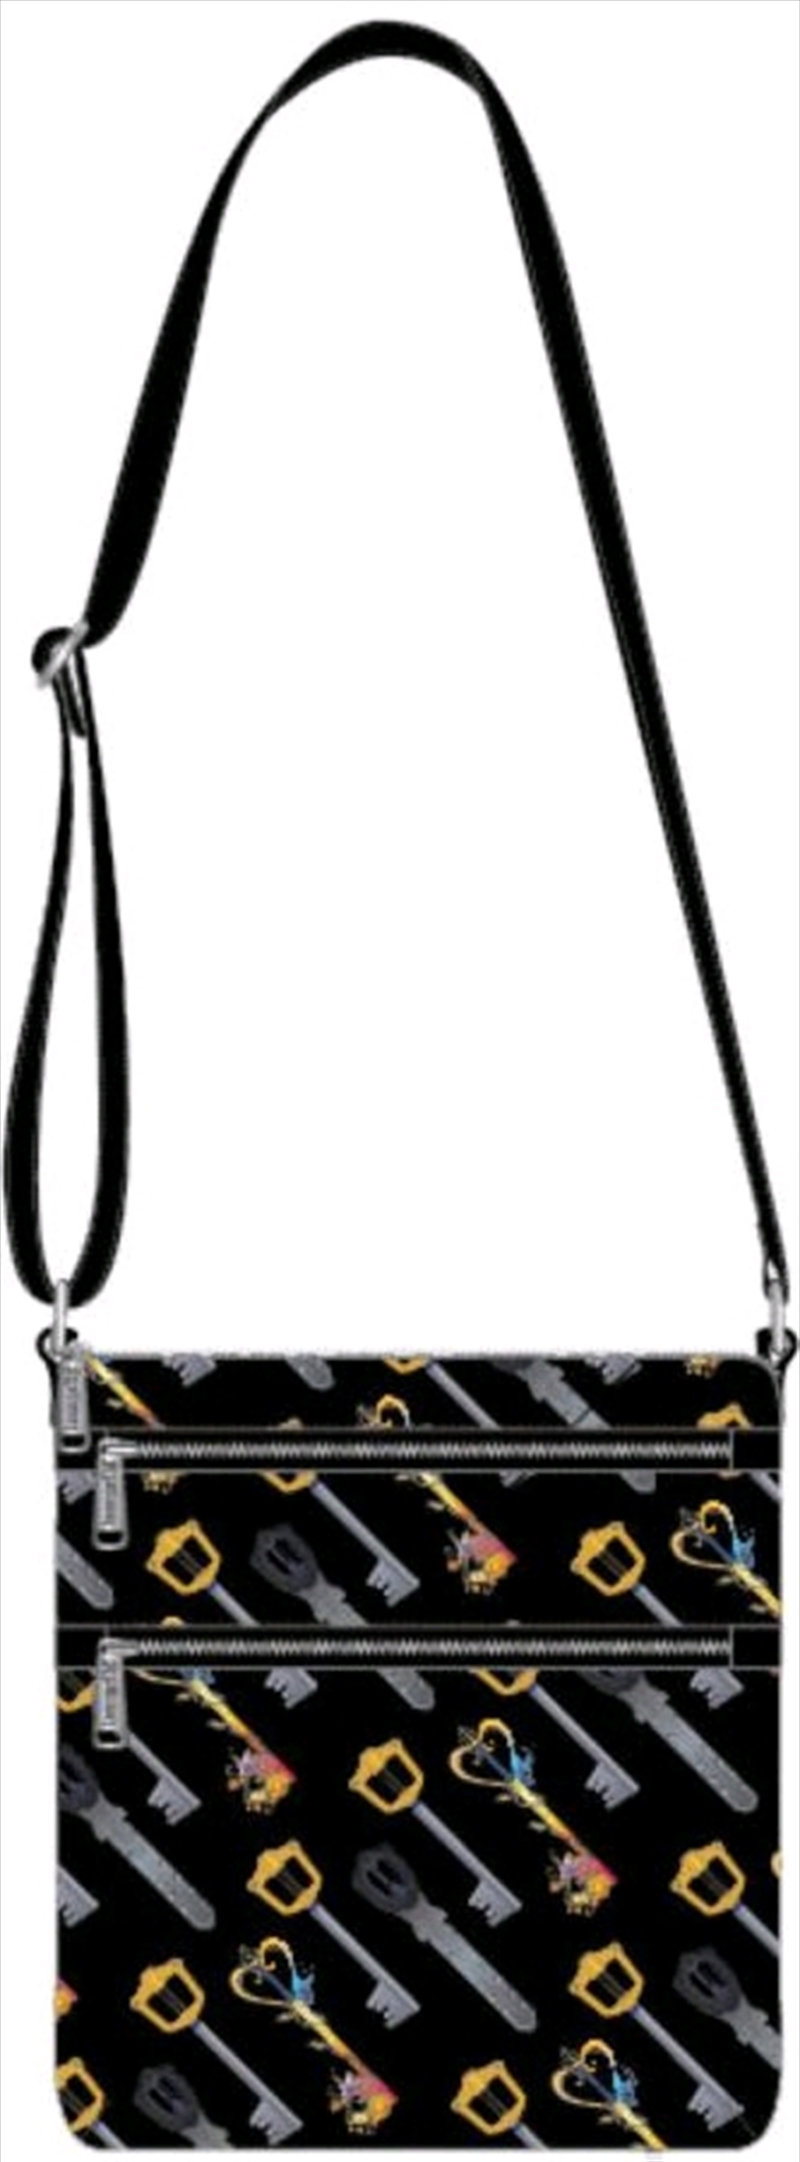 Kingdom Hearts - Keys Passport Bag | Apparel